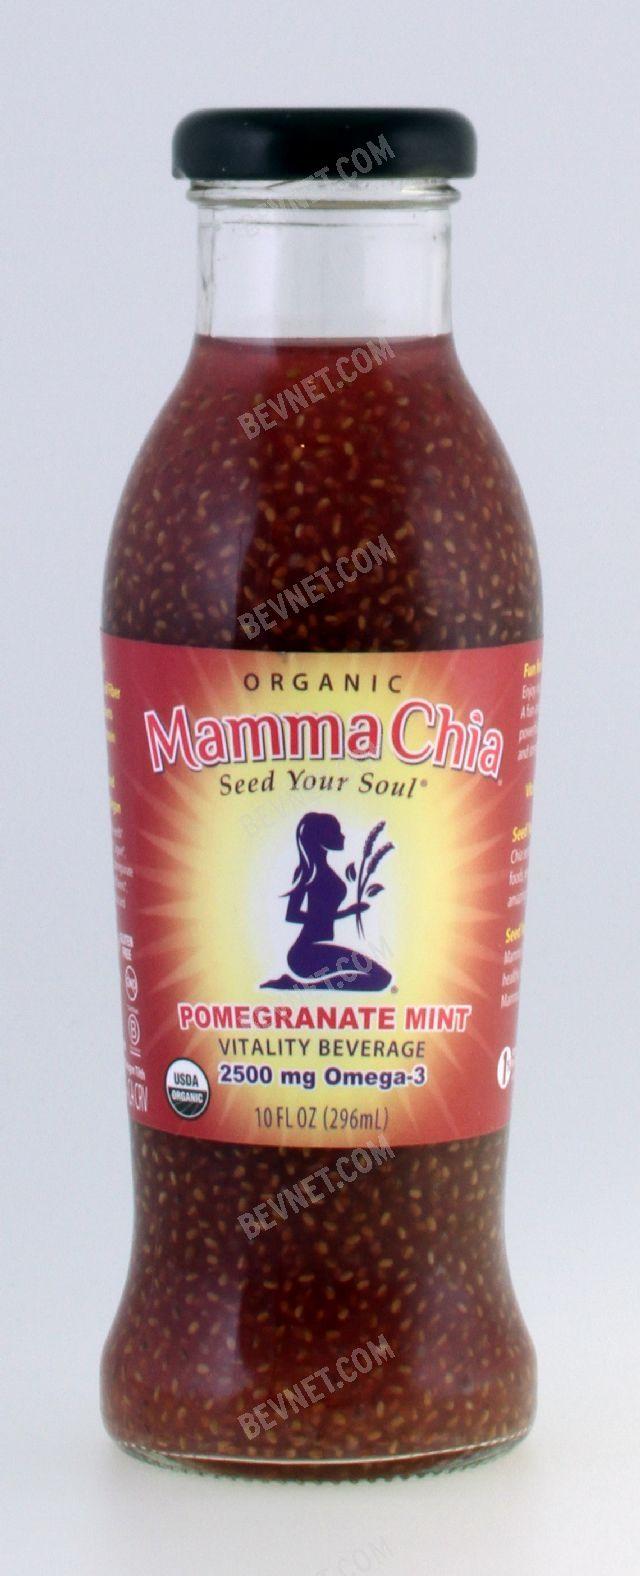 Mamma Chia Organic Vitality Beverages: